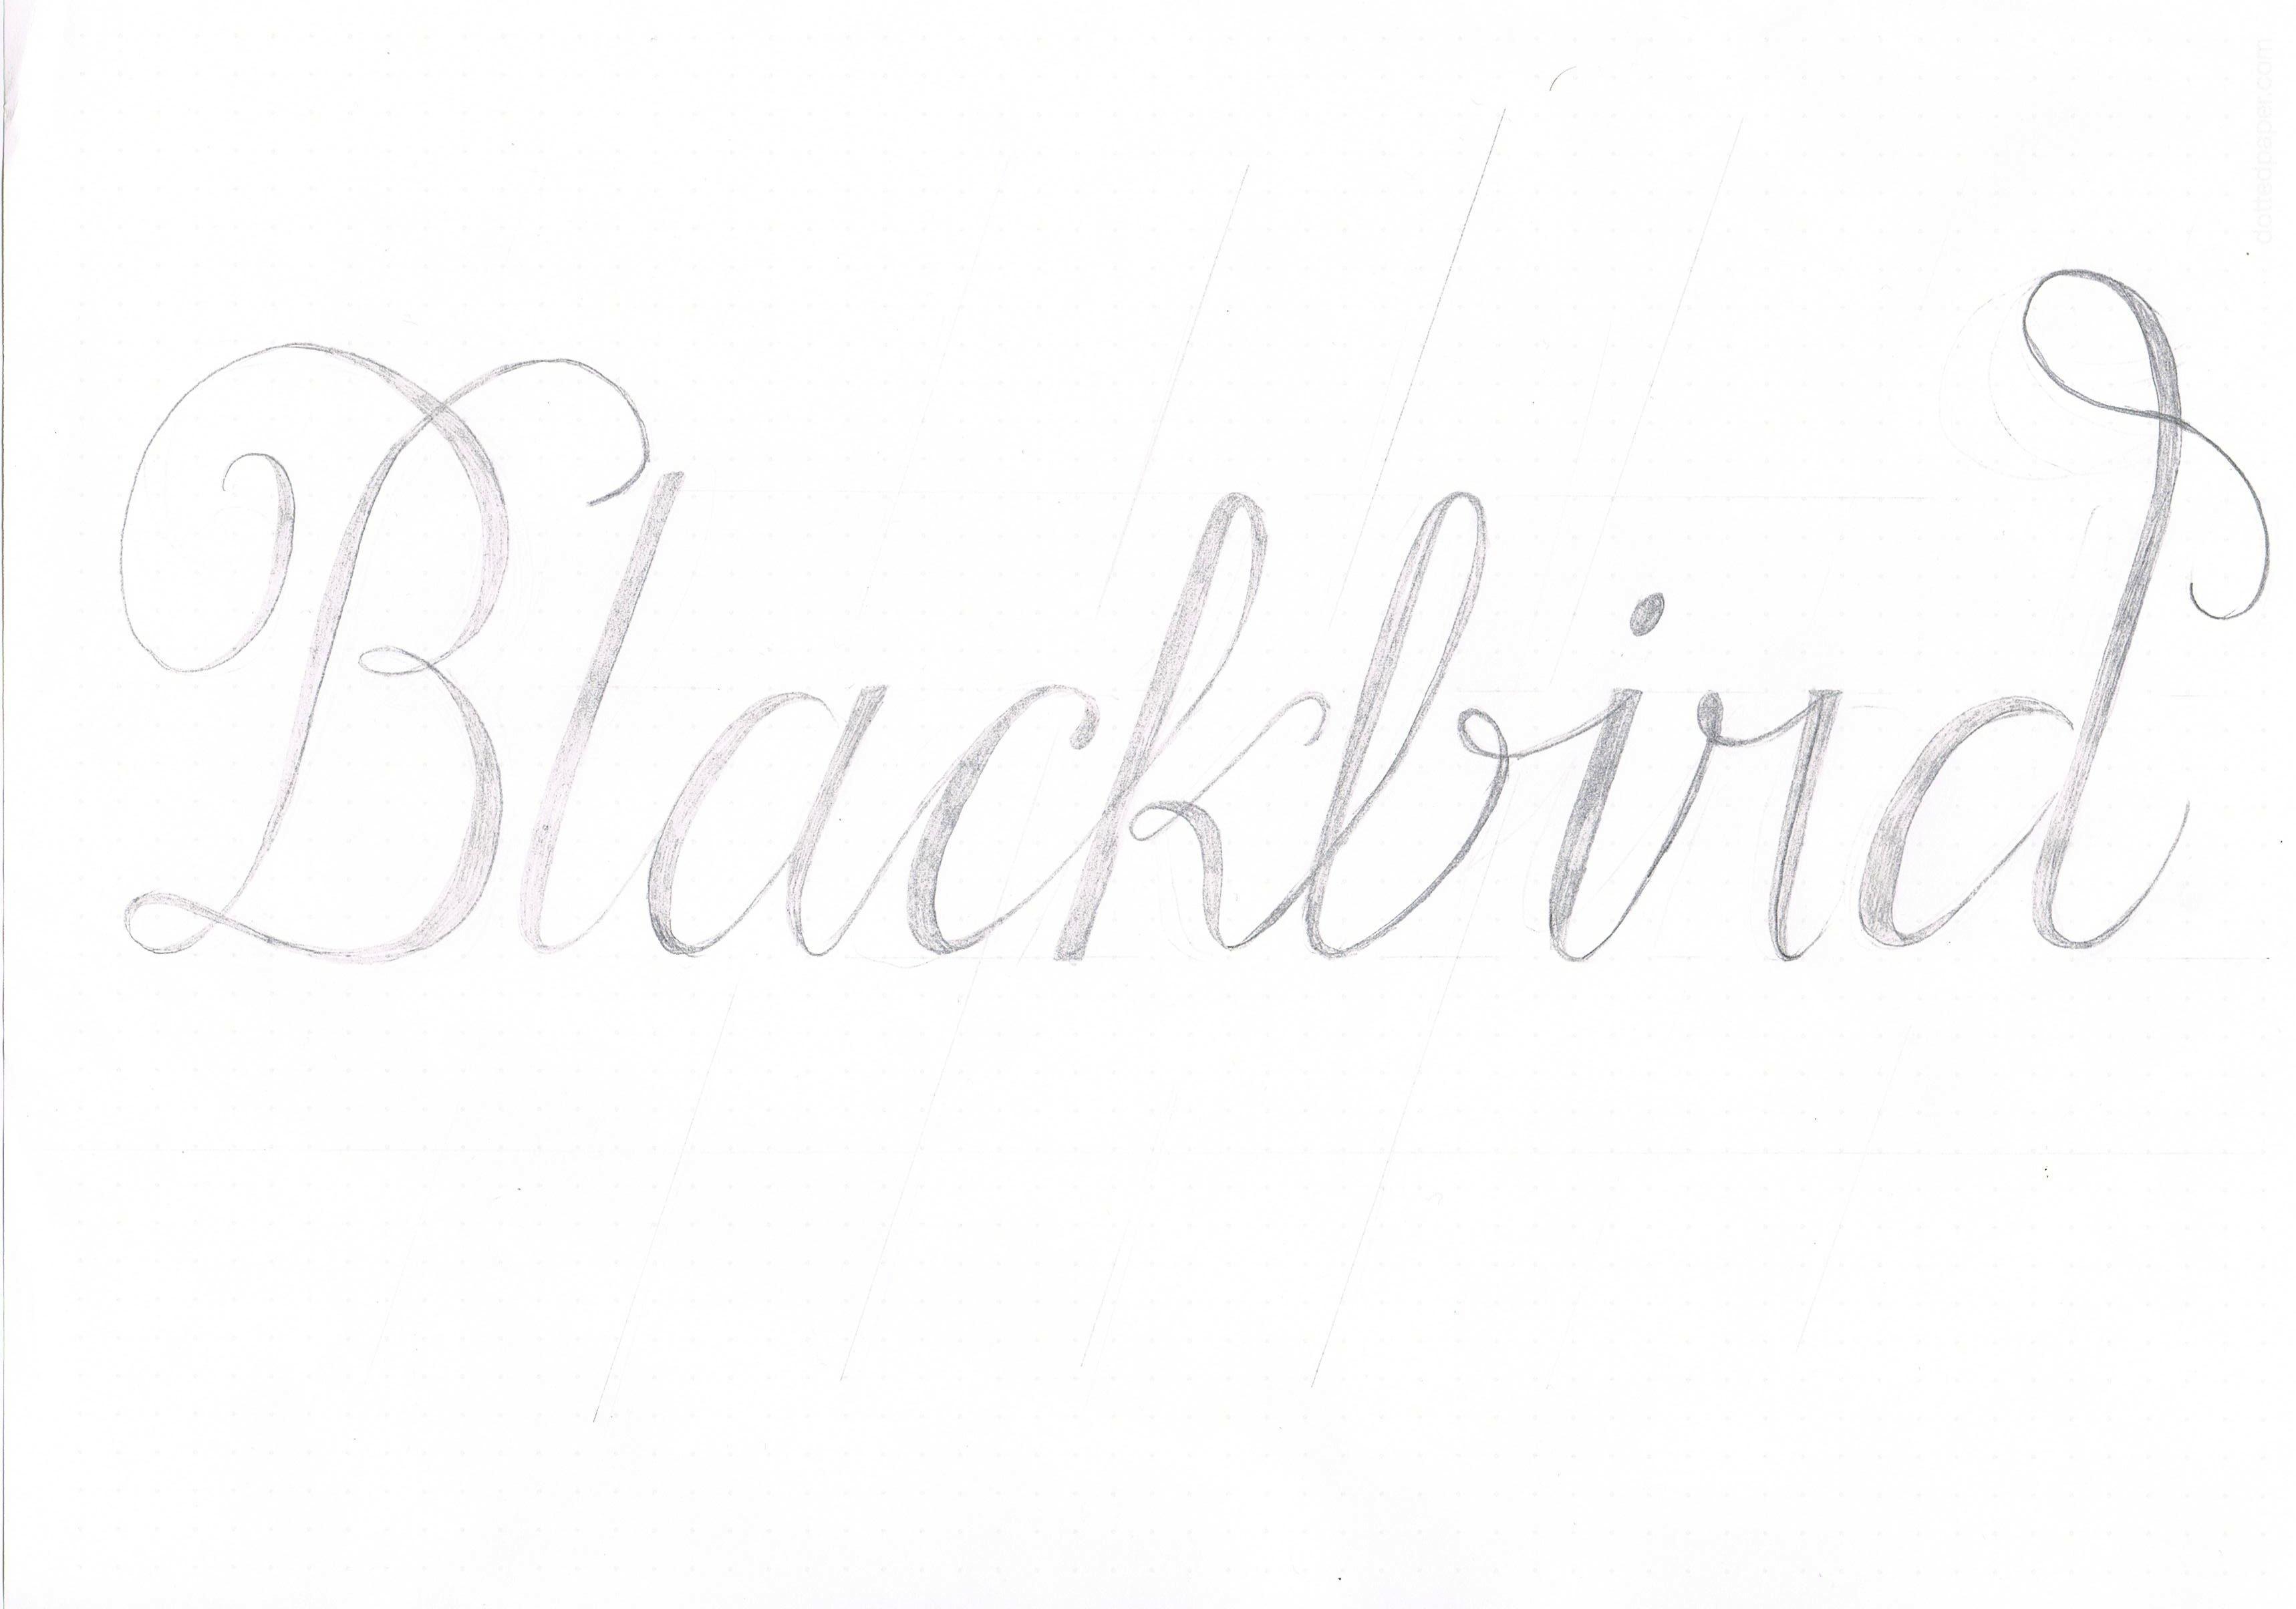 Blackbird. - image 1 - student project